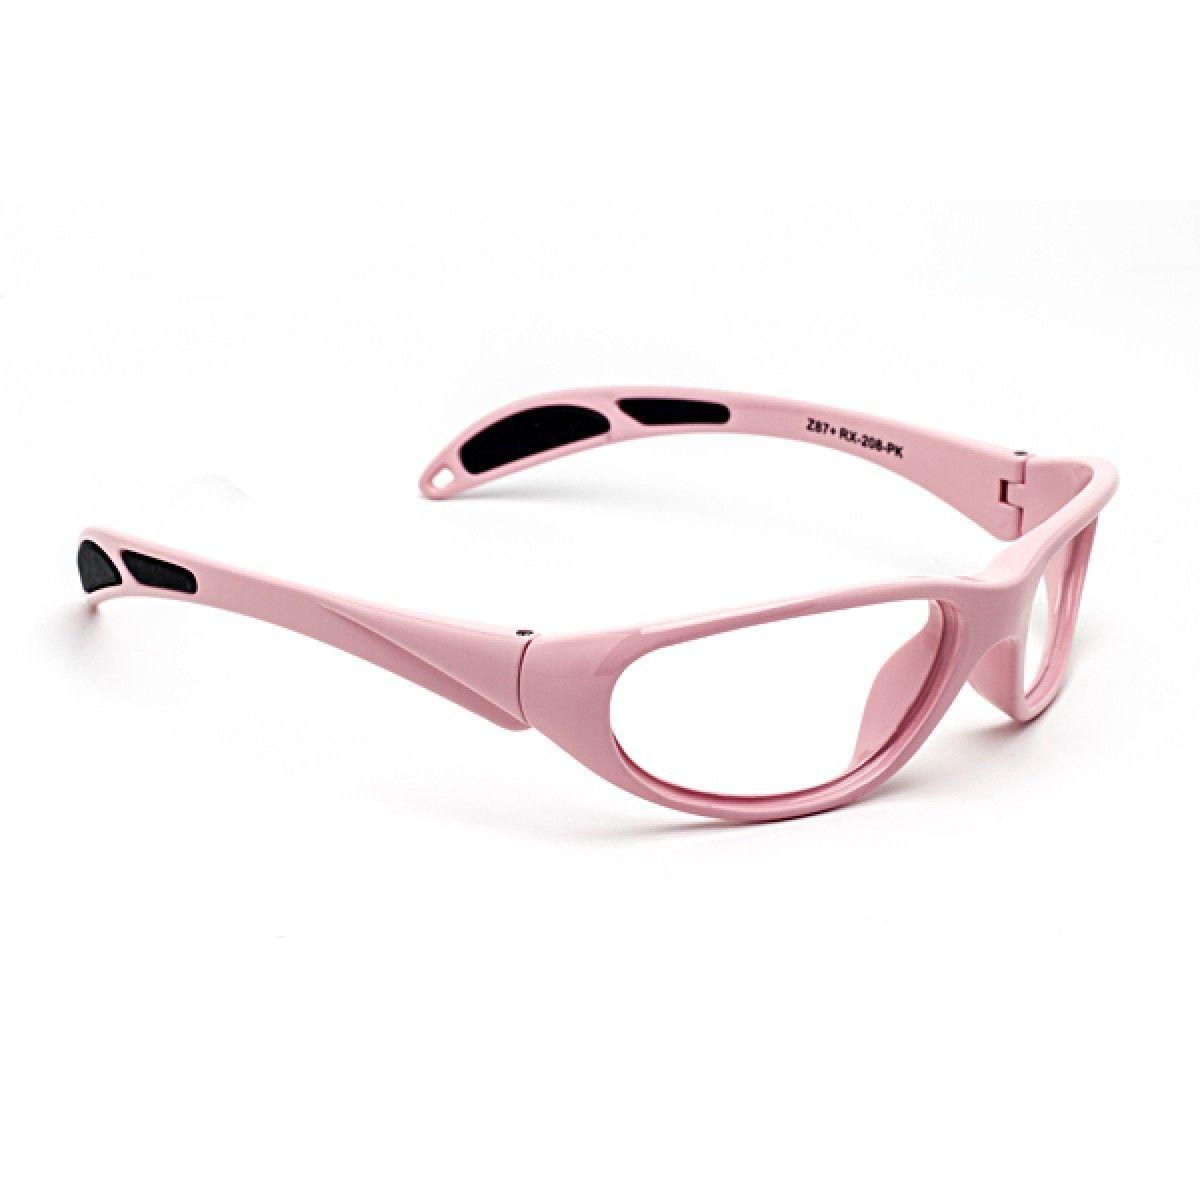 Stylish Womens Prescription Safety Glasses References